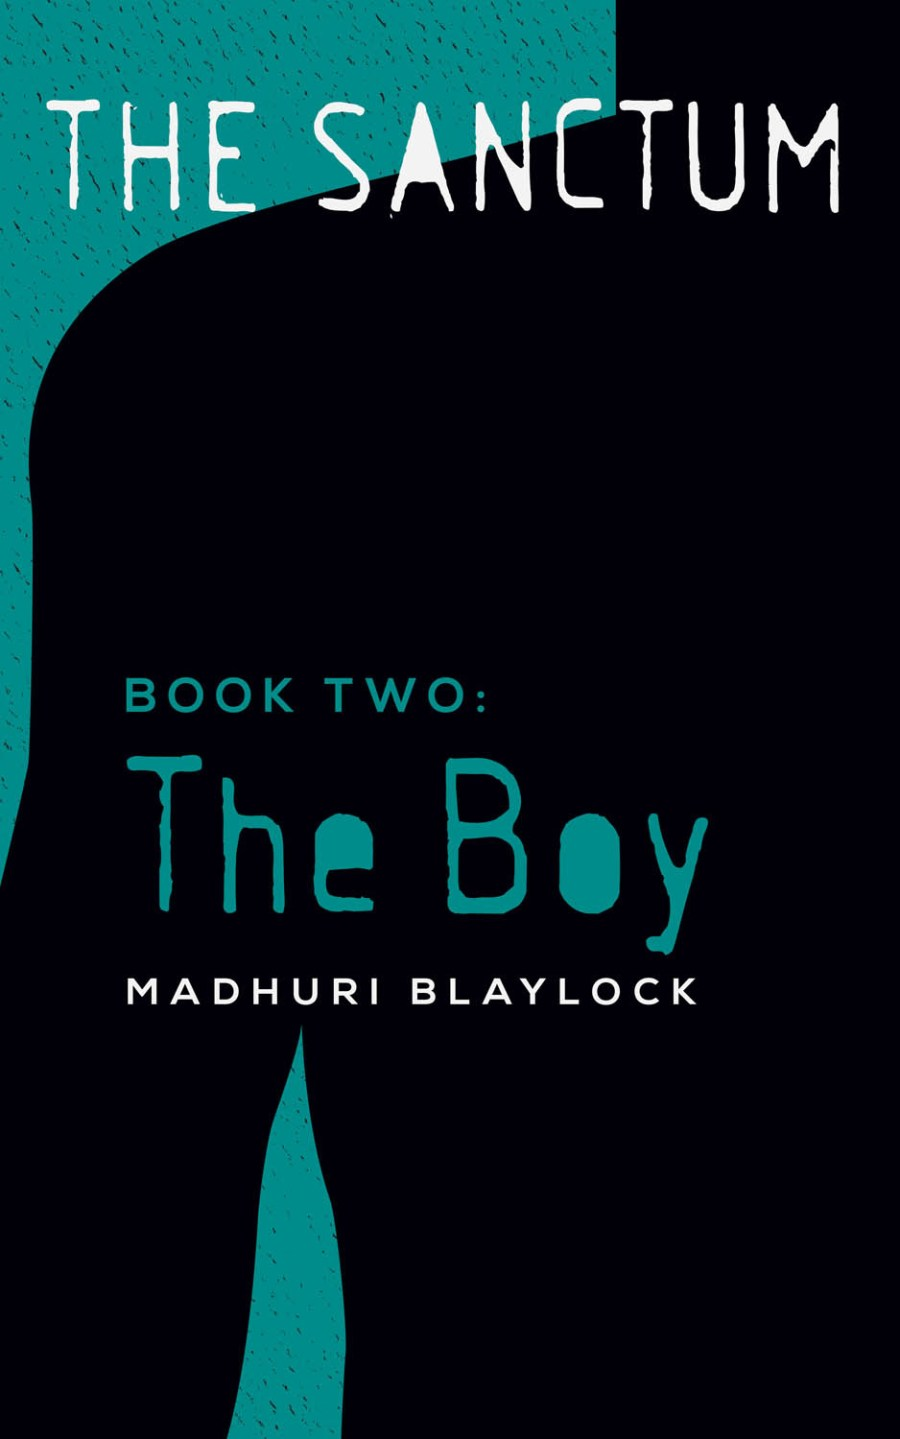 novel written by Madhuri Blaylock